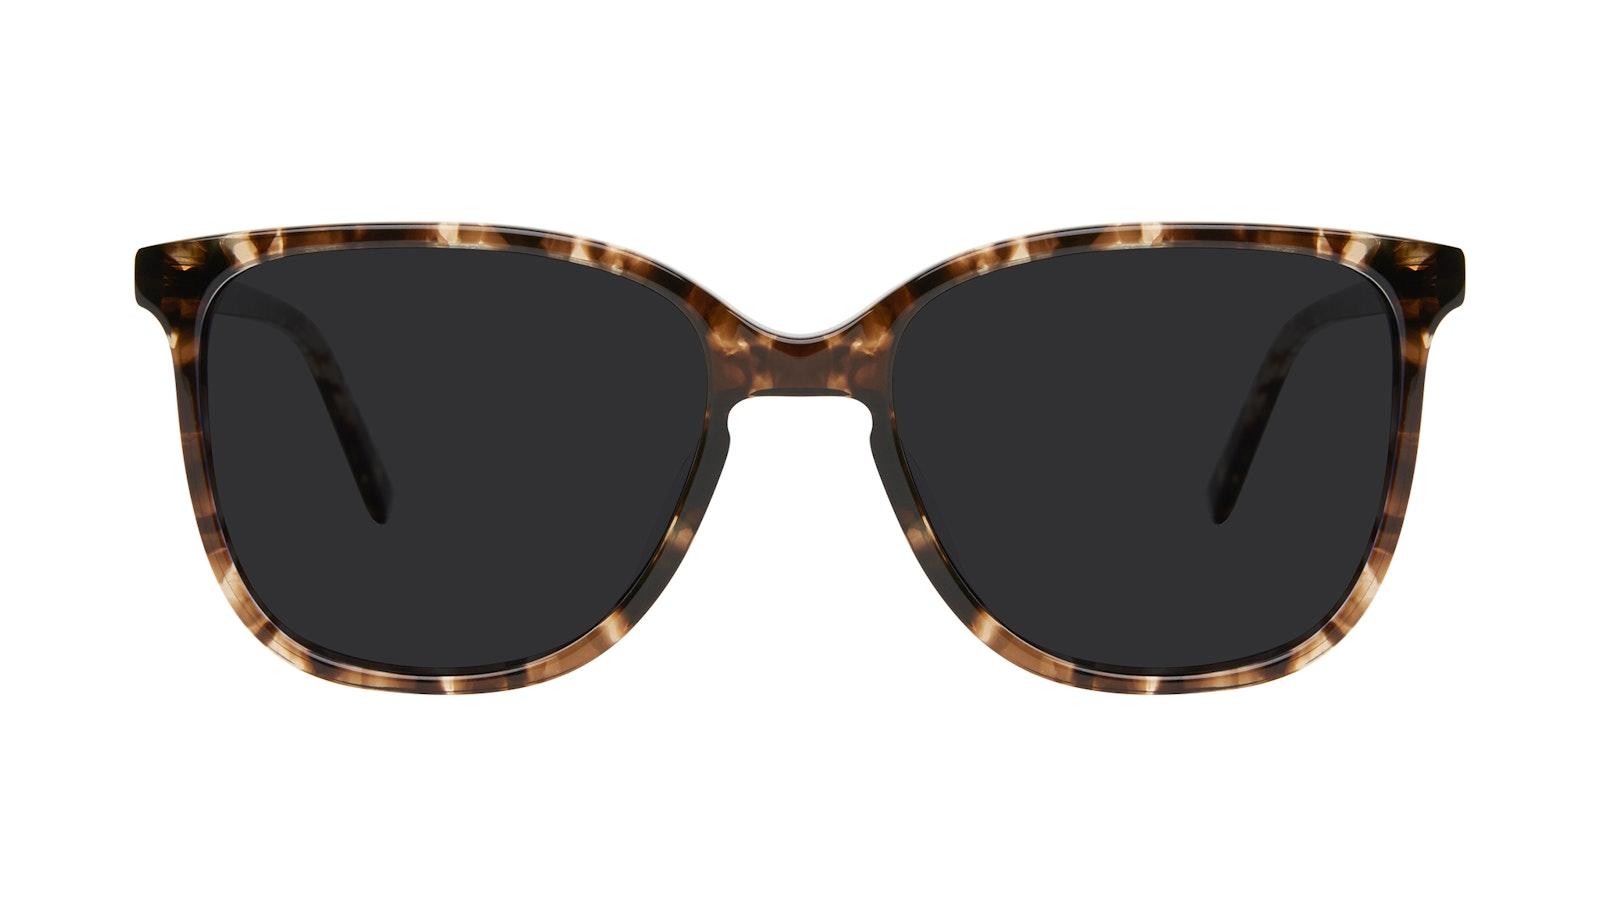 Affordable Fashion Glasses Square Sunglasses Women Lead Leopard